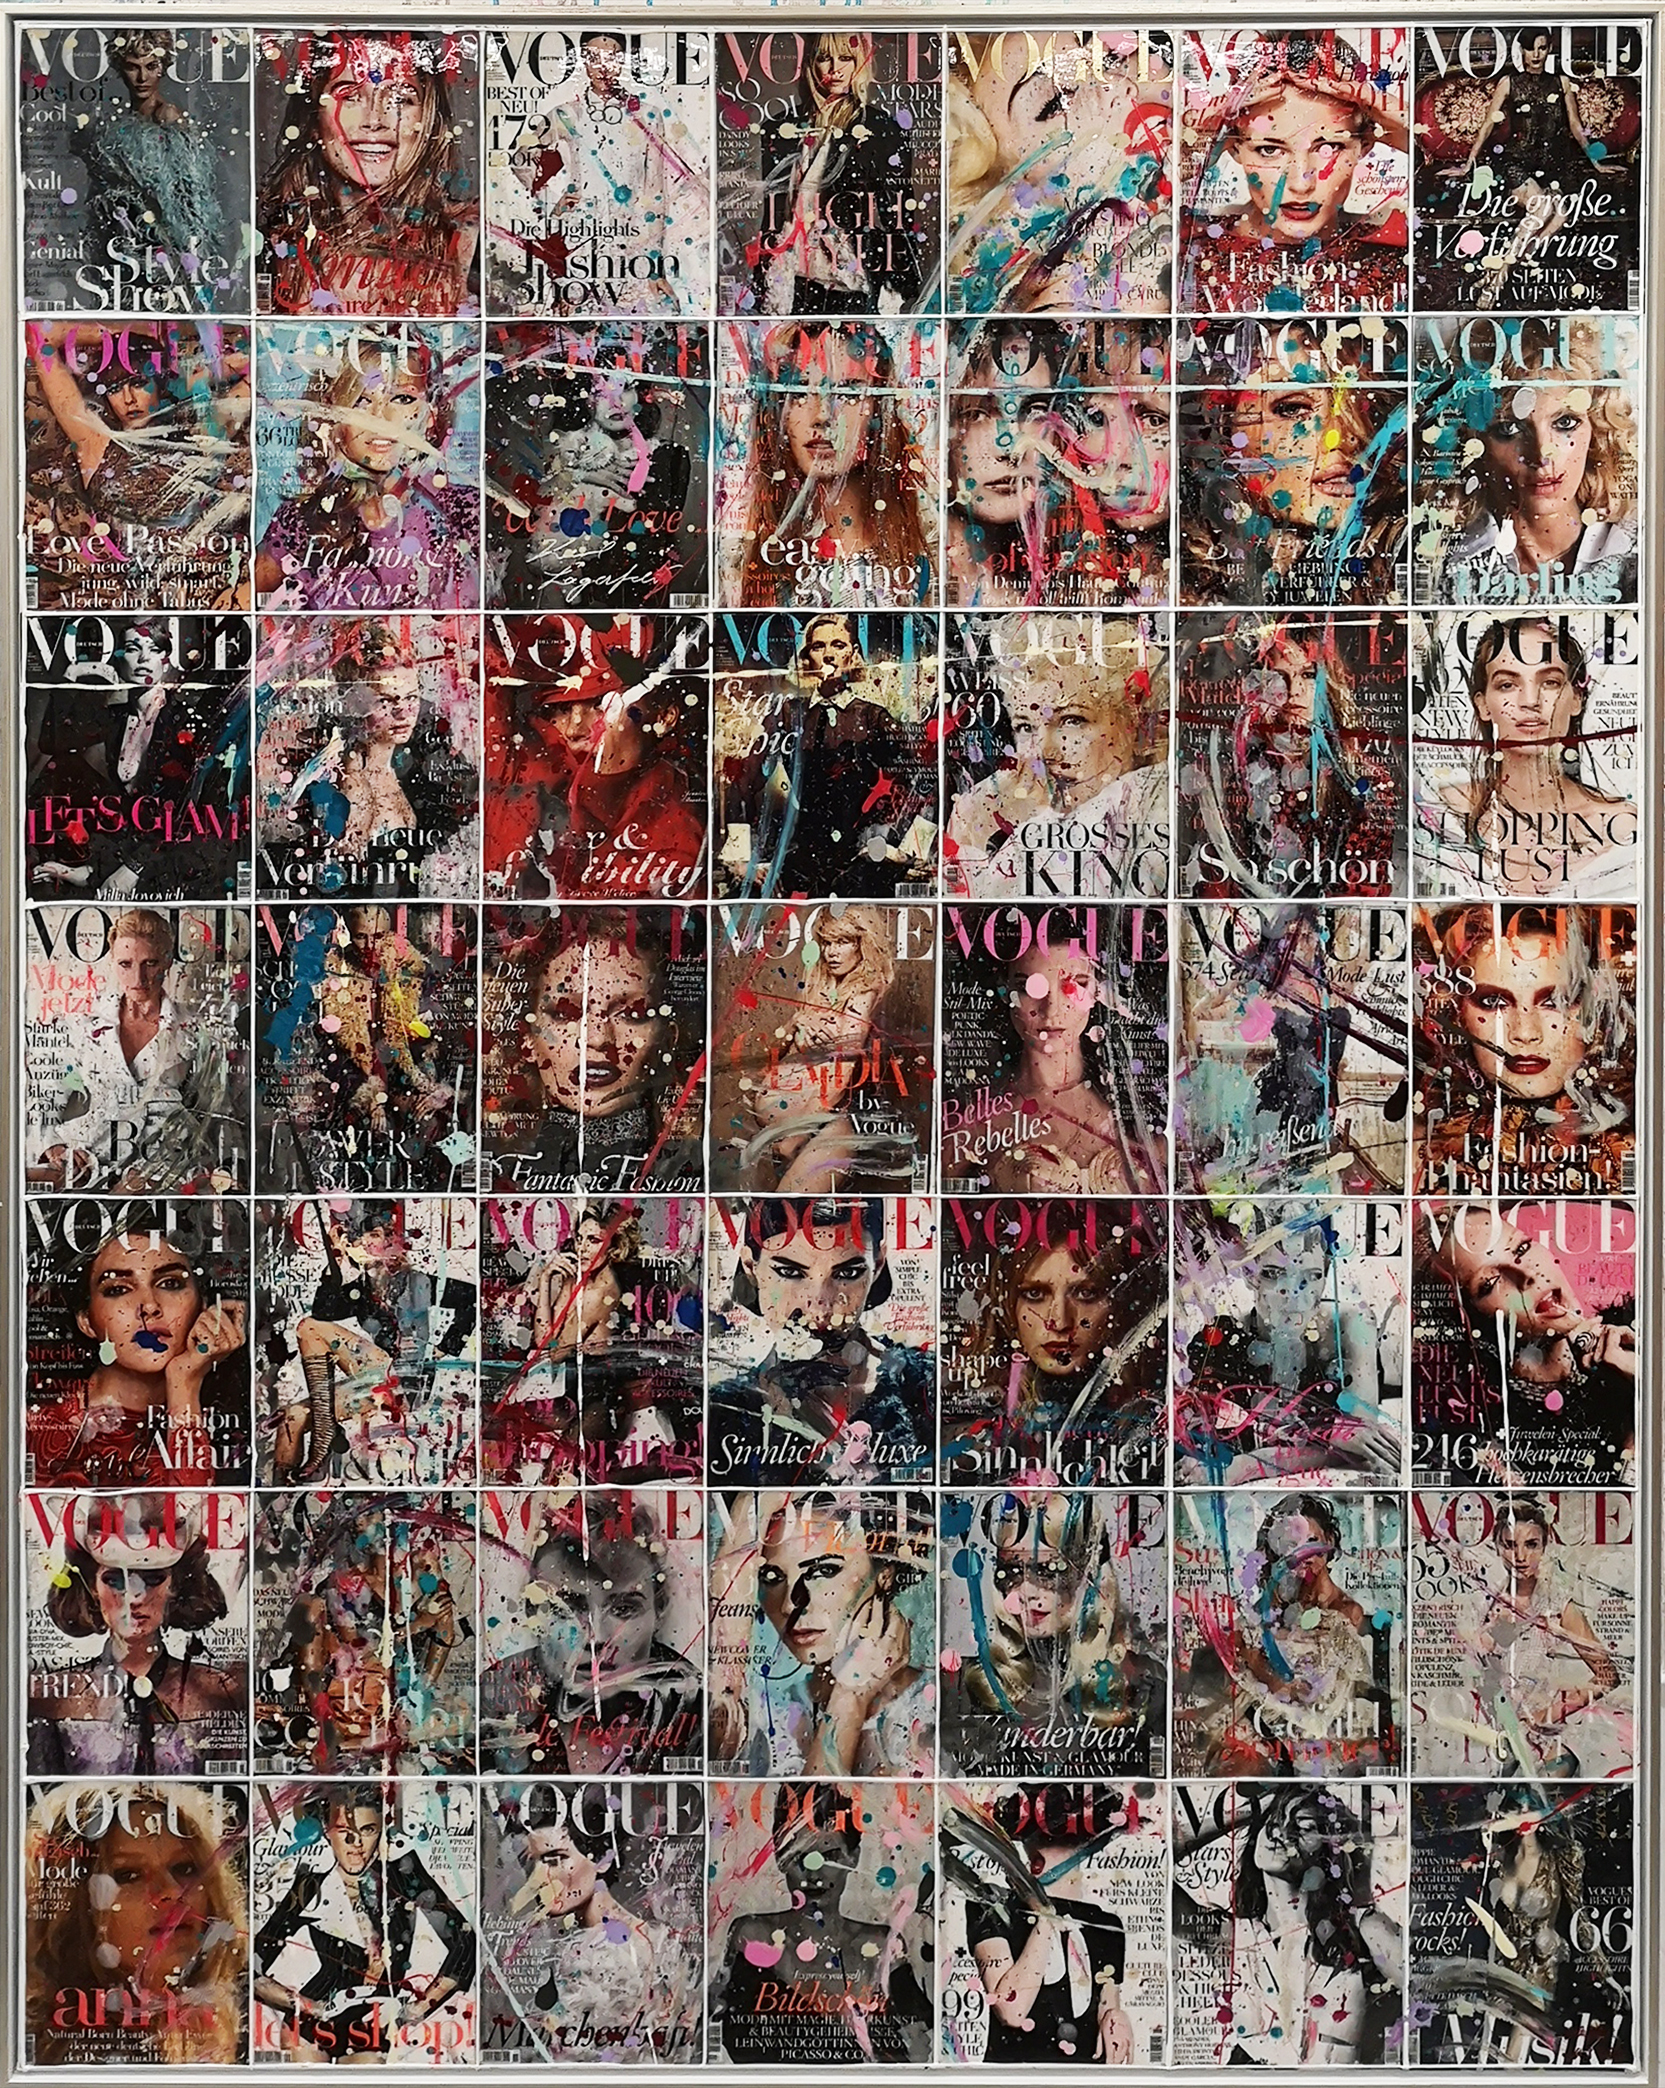 Vogue_198x153cm